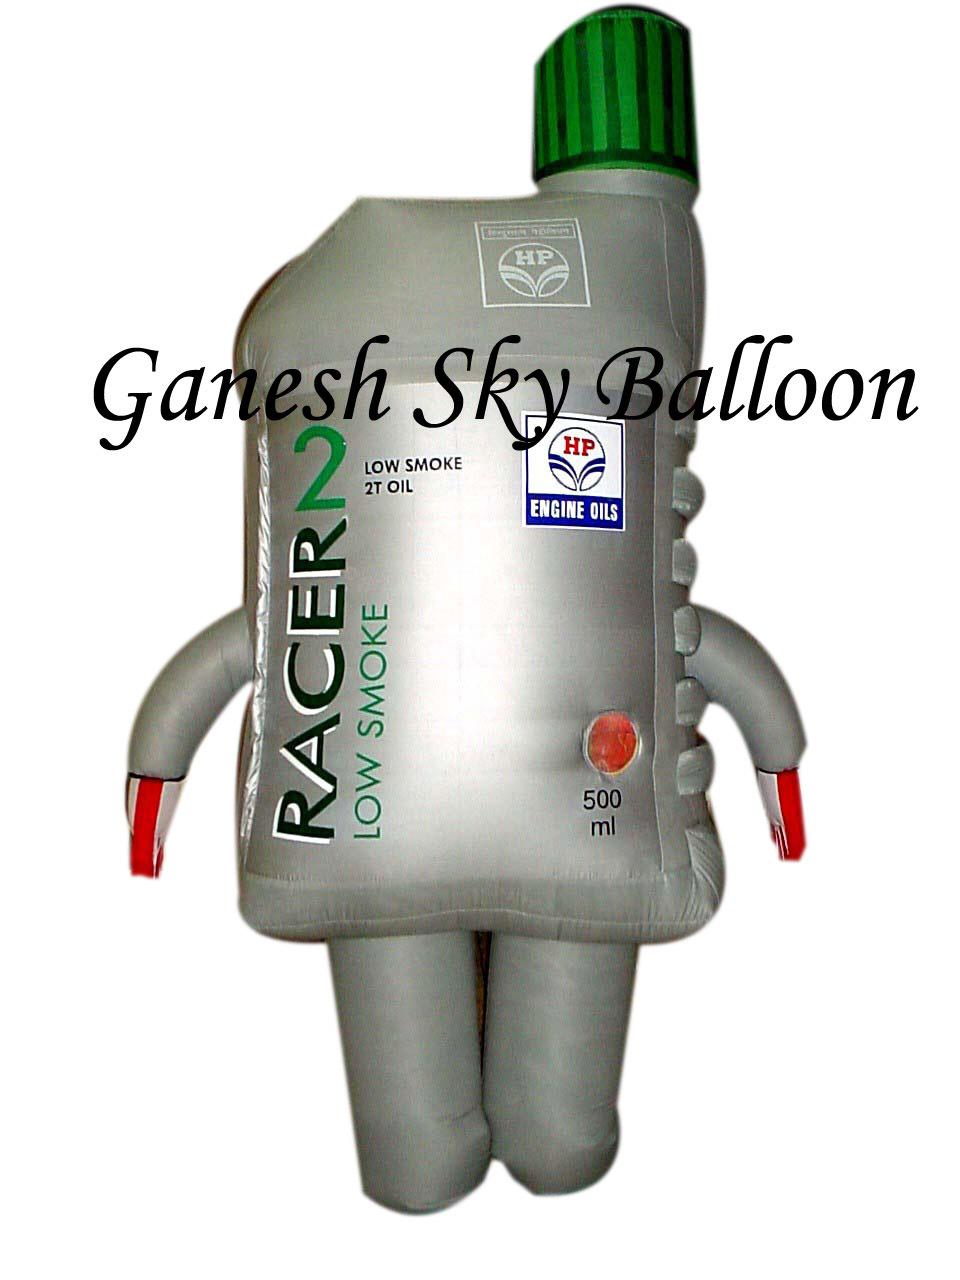 MC Dowells Inflatable Costume